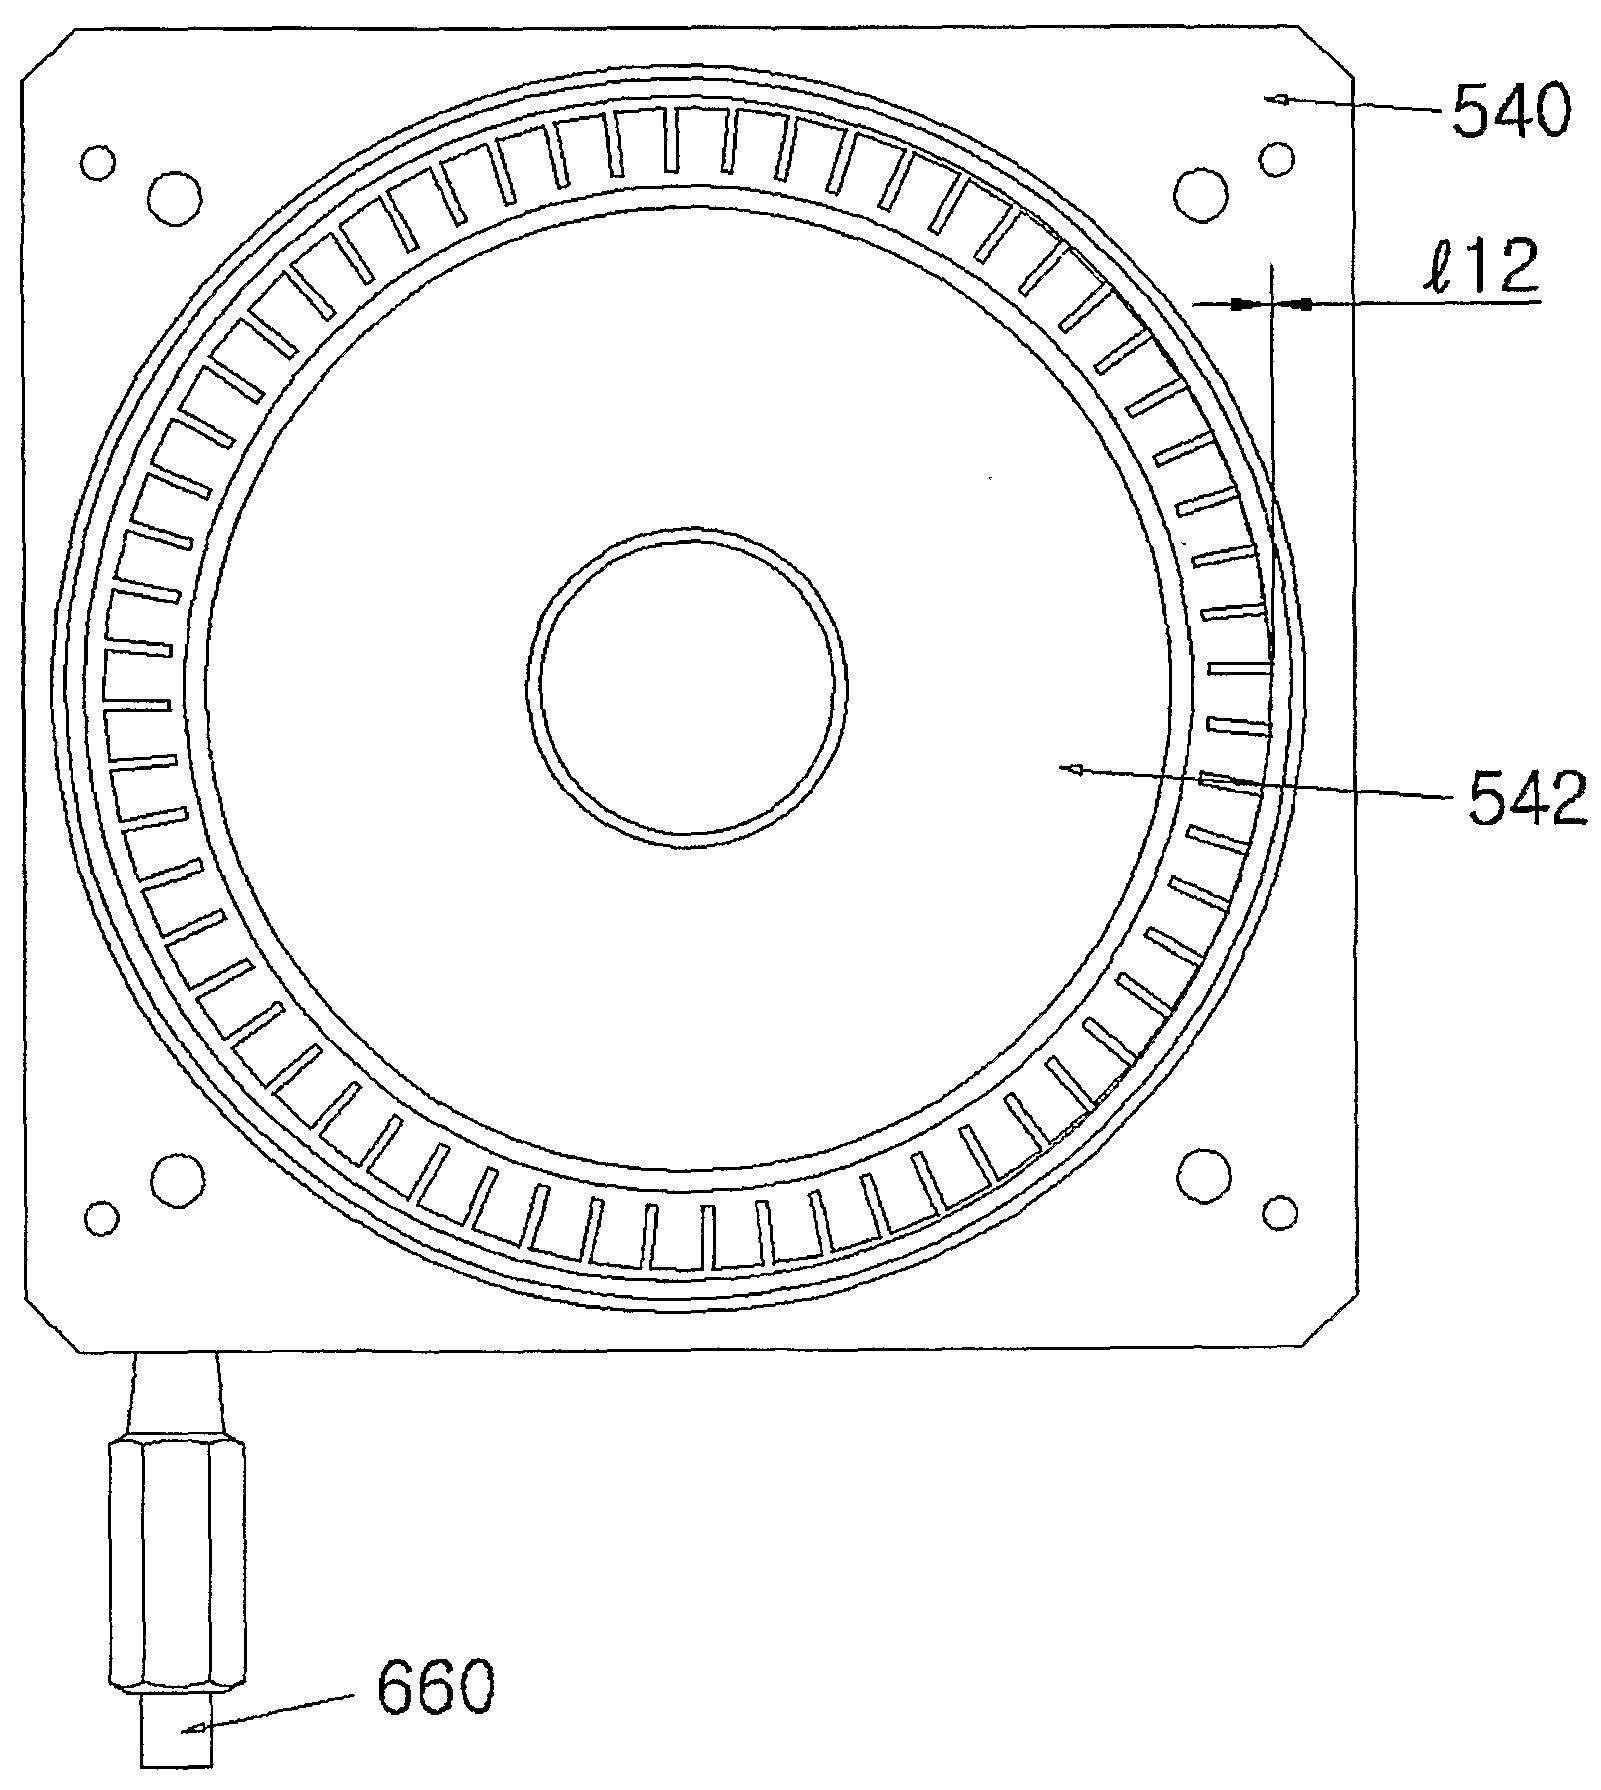 Marvair Wiring Diagram | Wiring Library